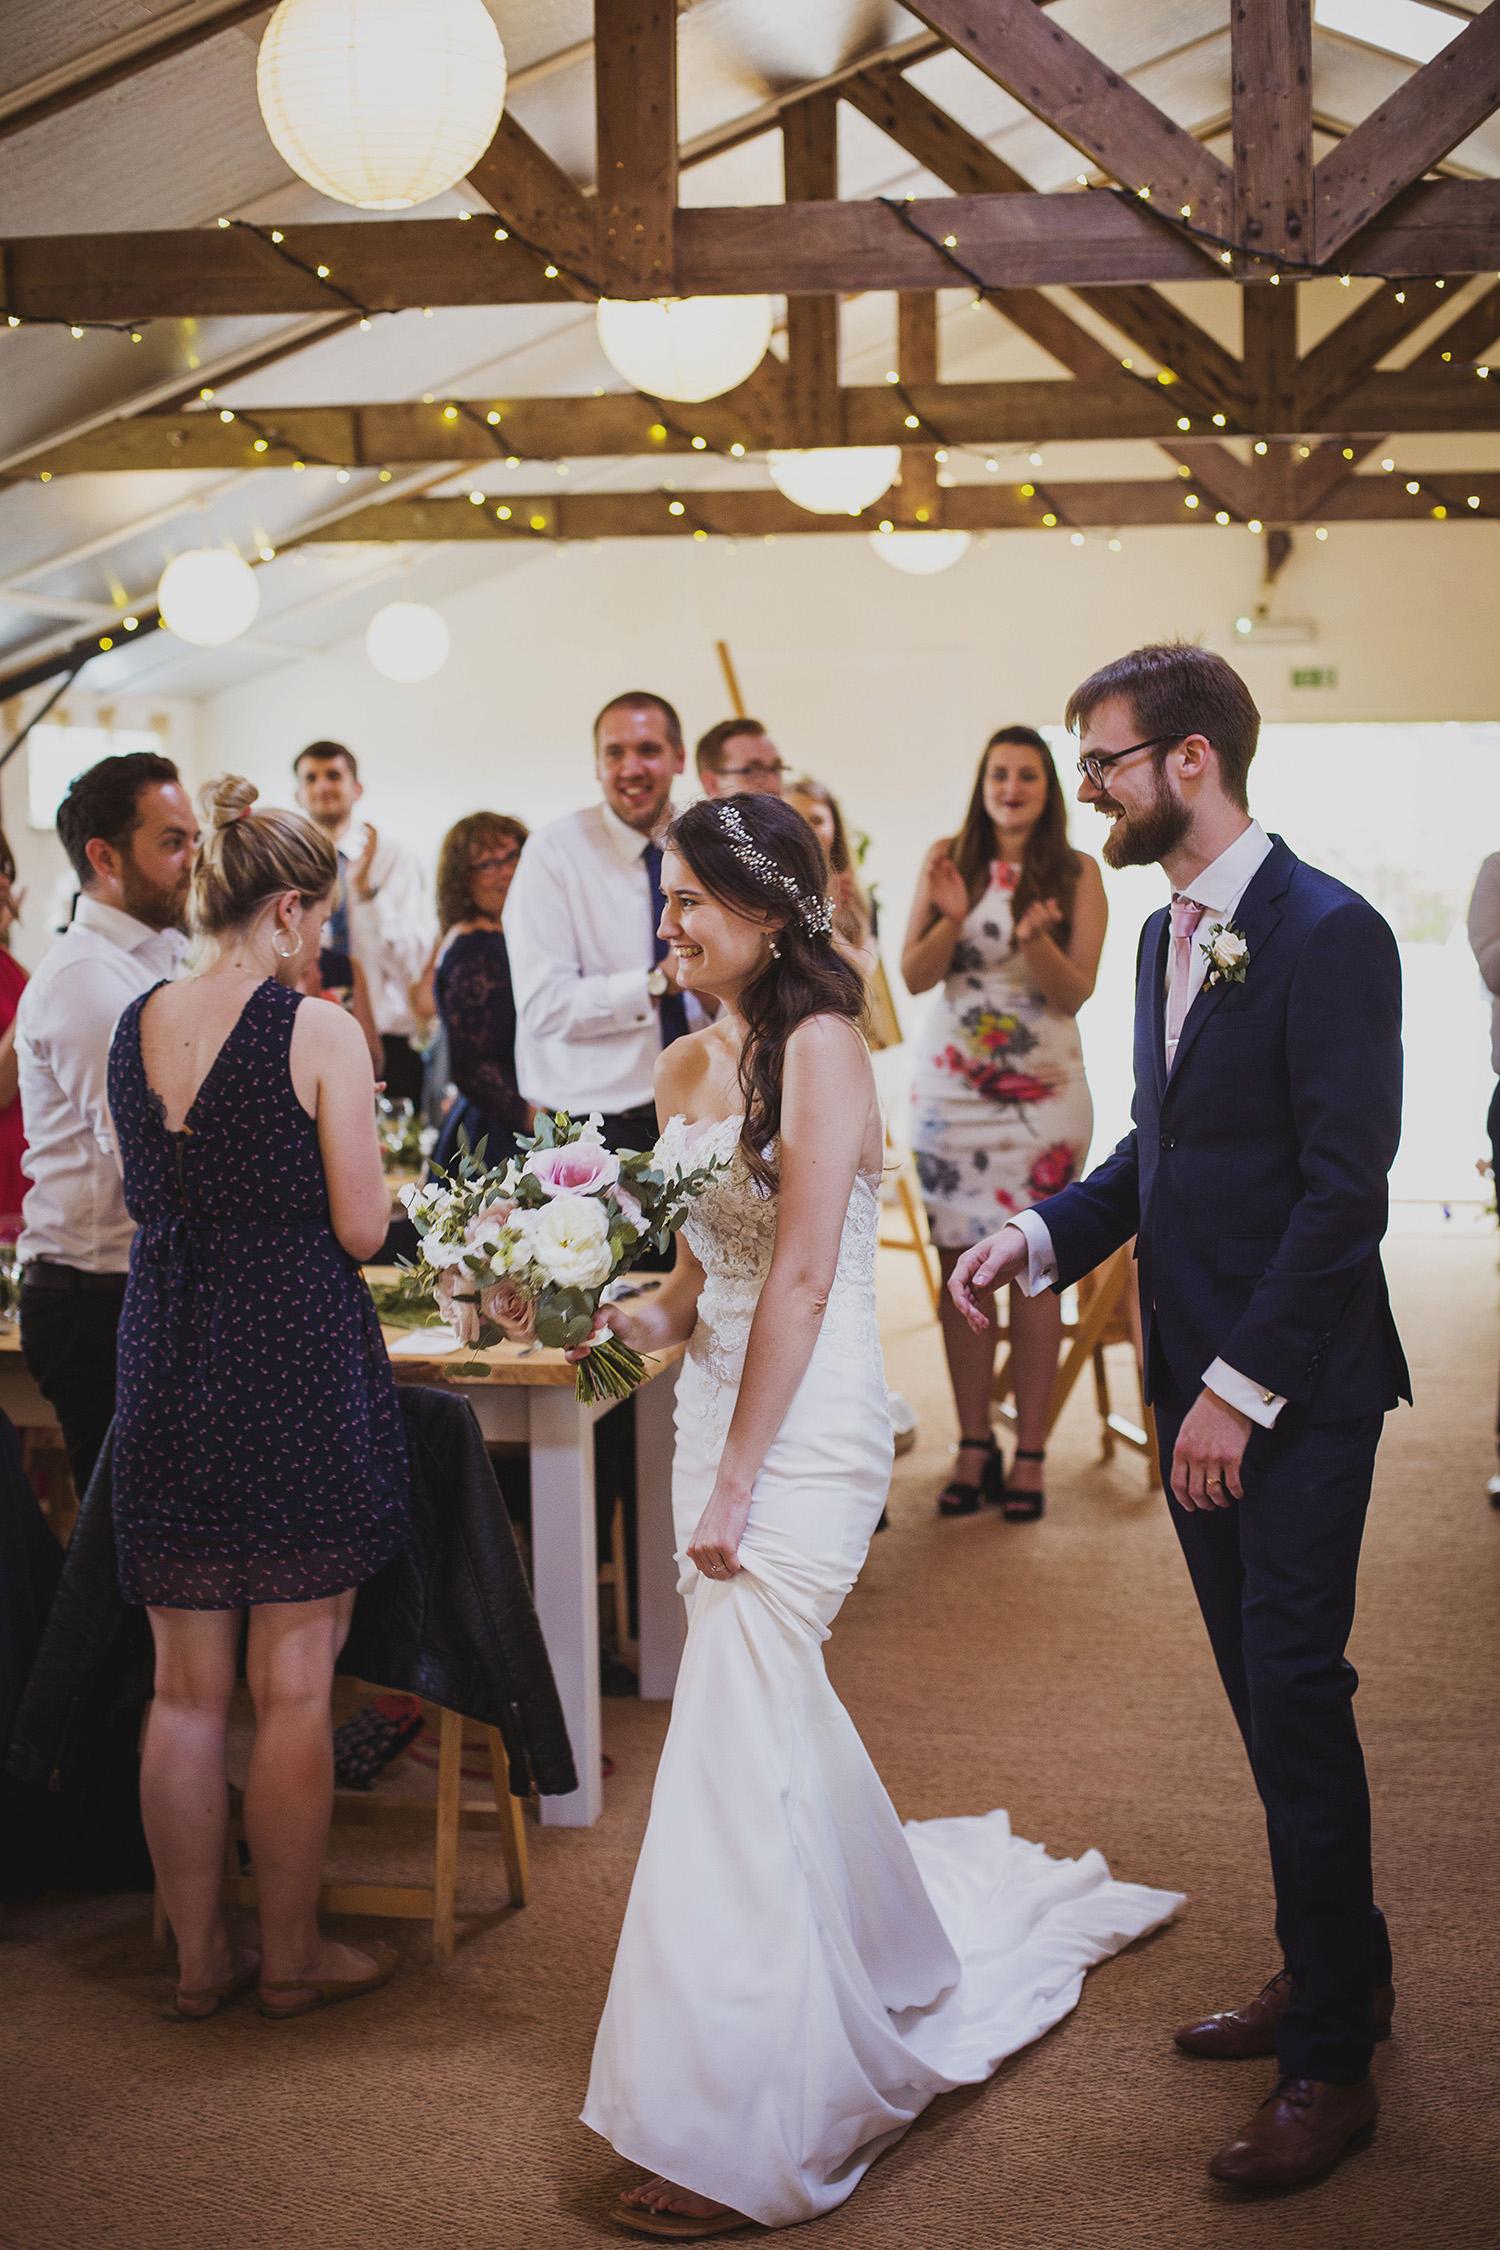 bride and groom entrance at cott farm barn wedding venue somerset